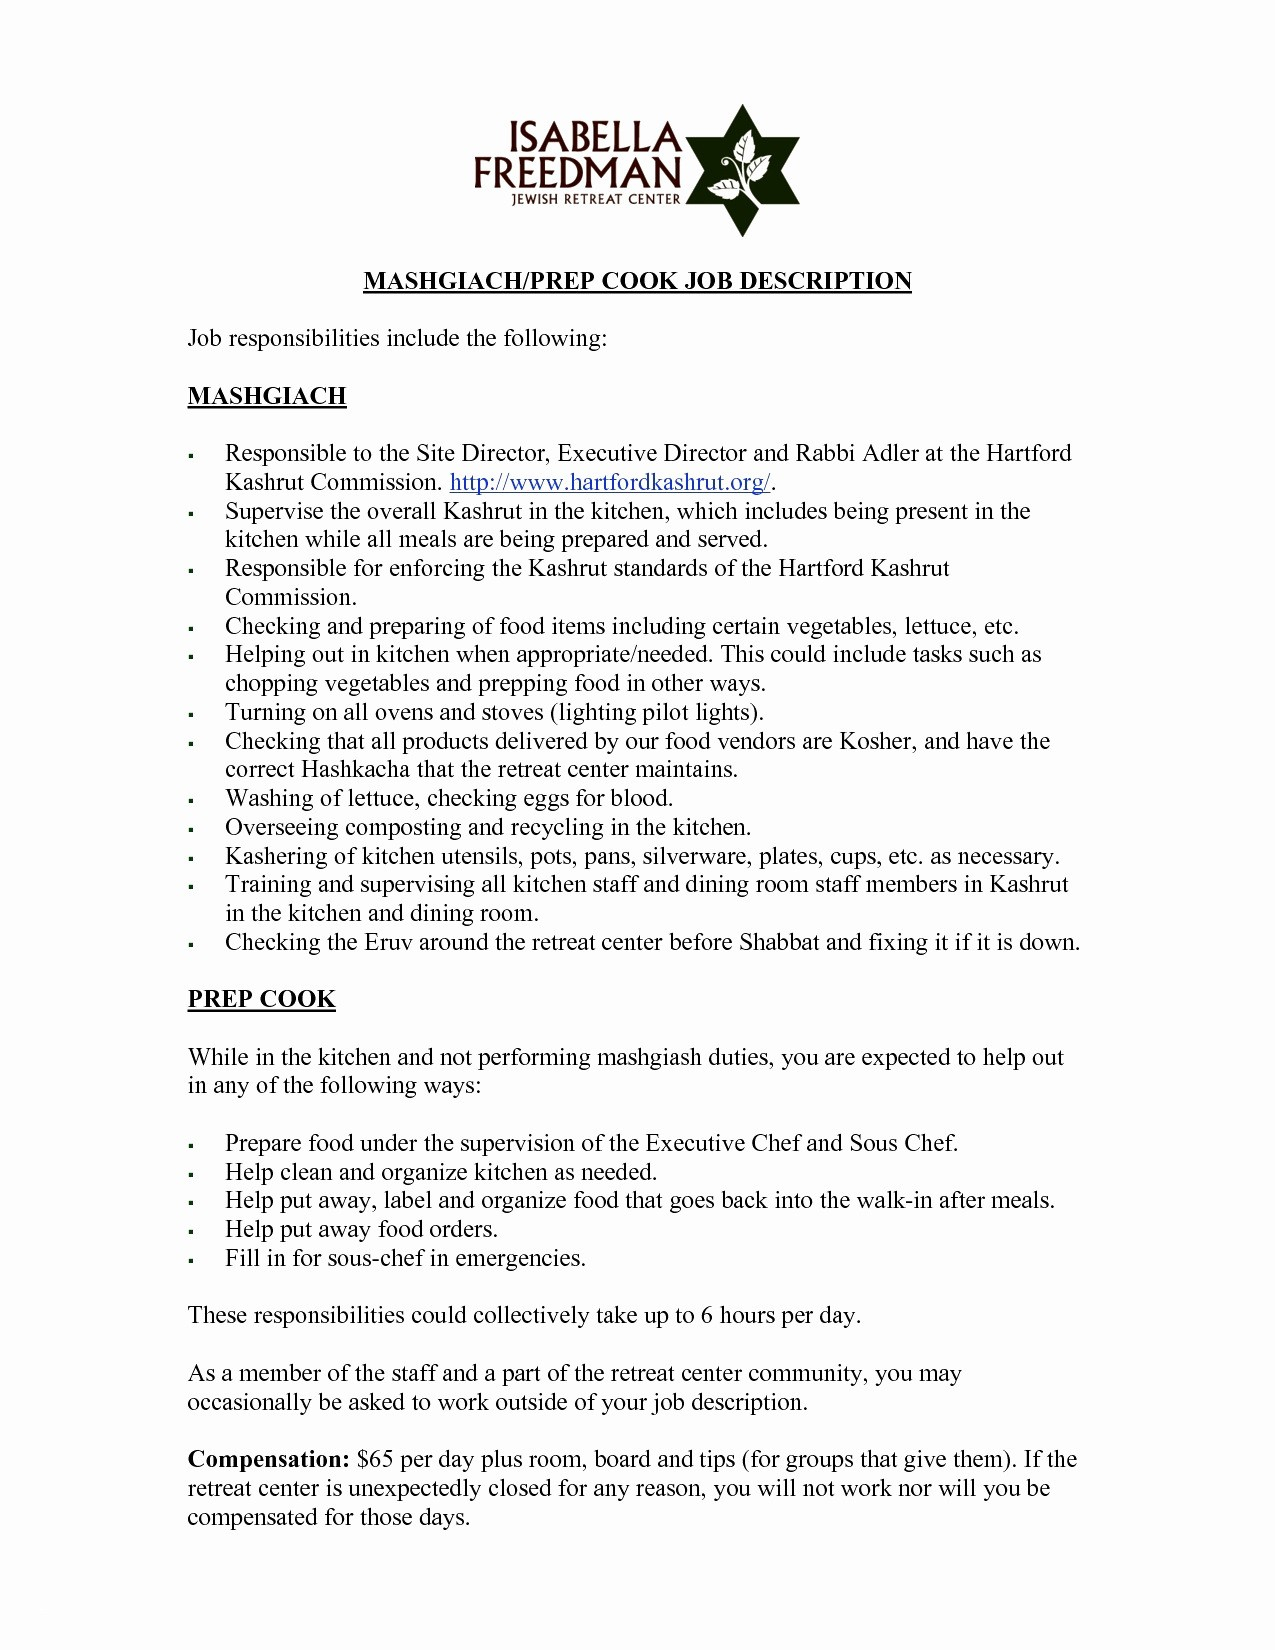 T Cover Letter Template - Resume Letter Doc New Resume Doc Template Luxury Resume and Cover